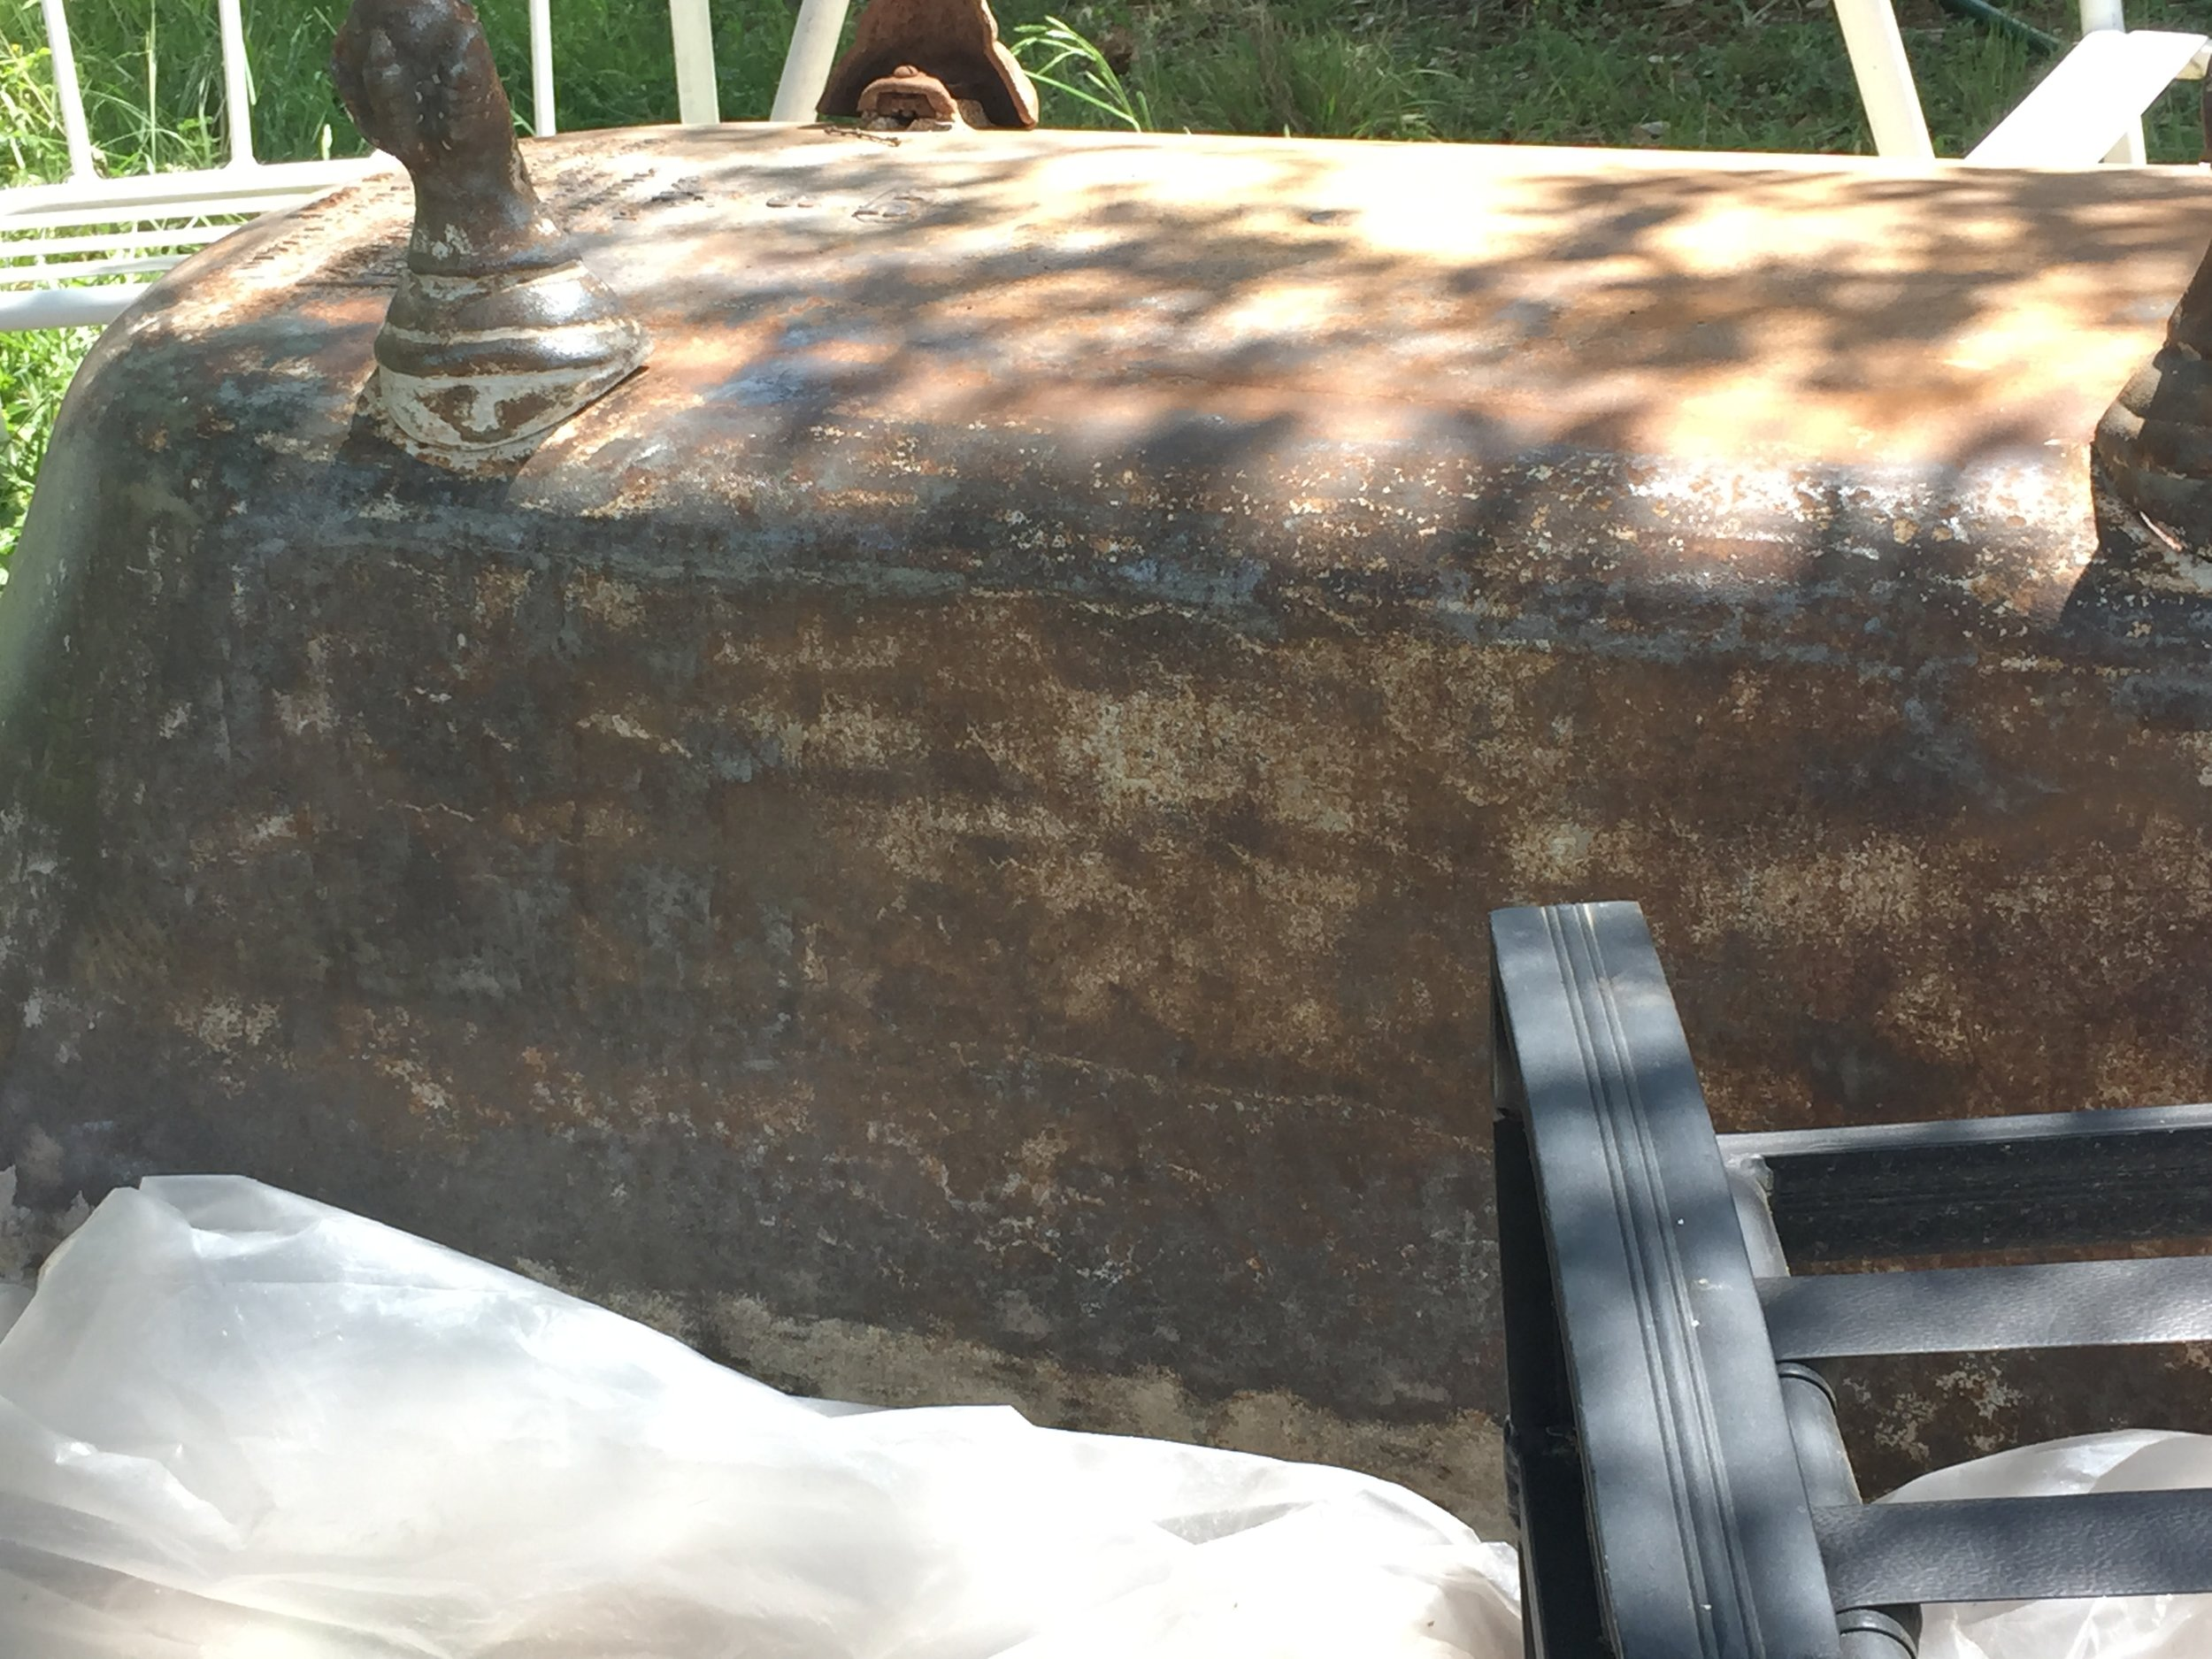 Sanding on the clawfoot tub-final sand